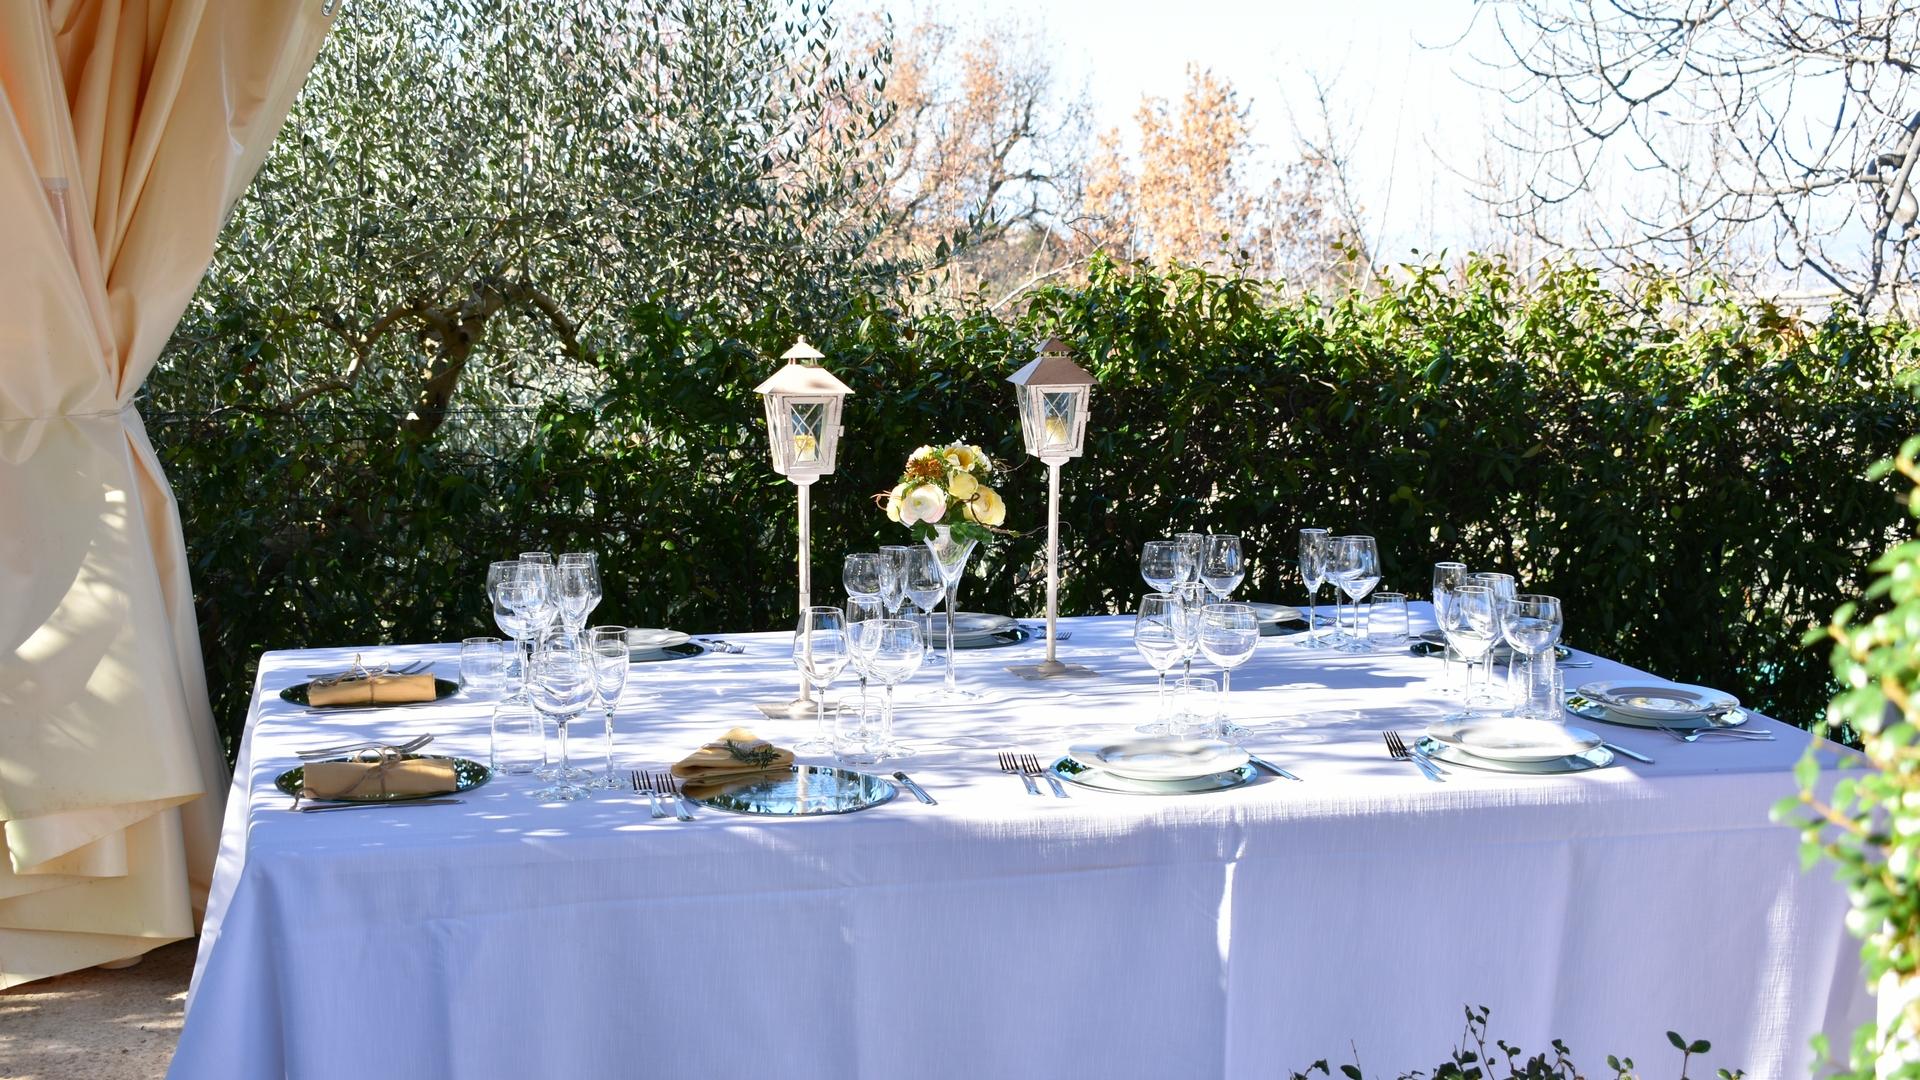 noleggio-tovaglie-stoviglie-piatti-bicchieri-catering-cerimonie-pma